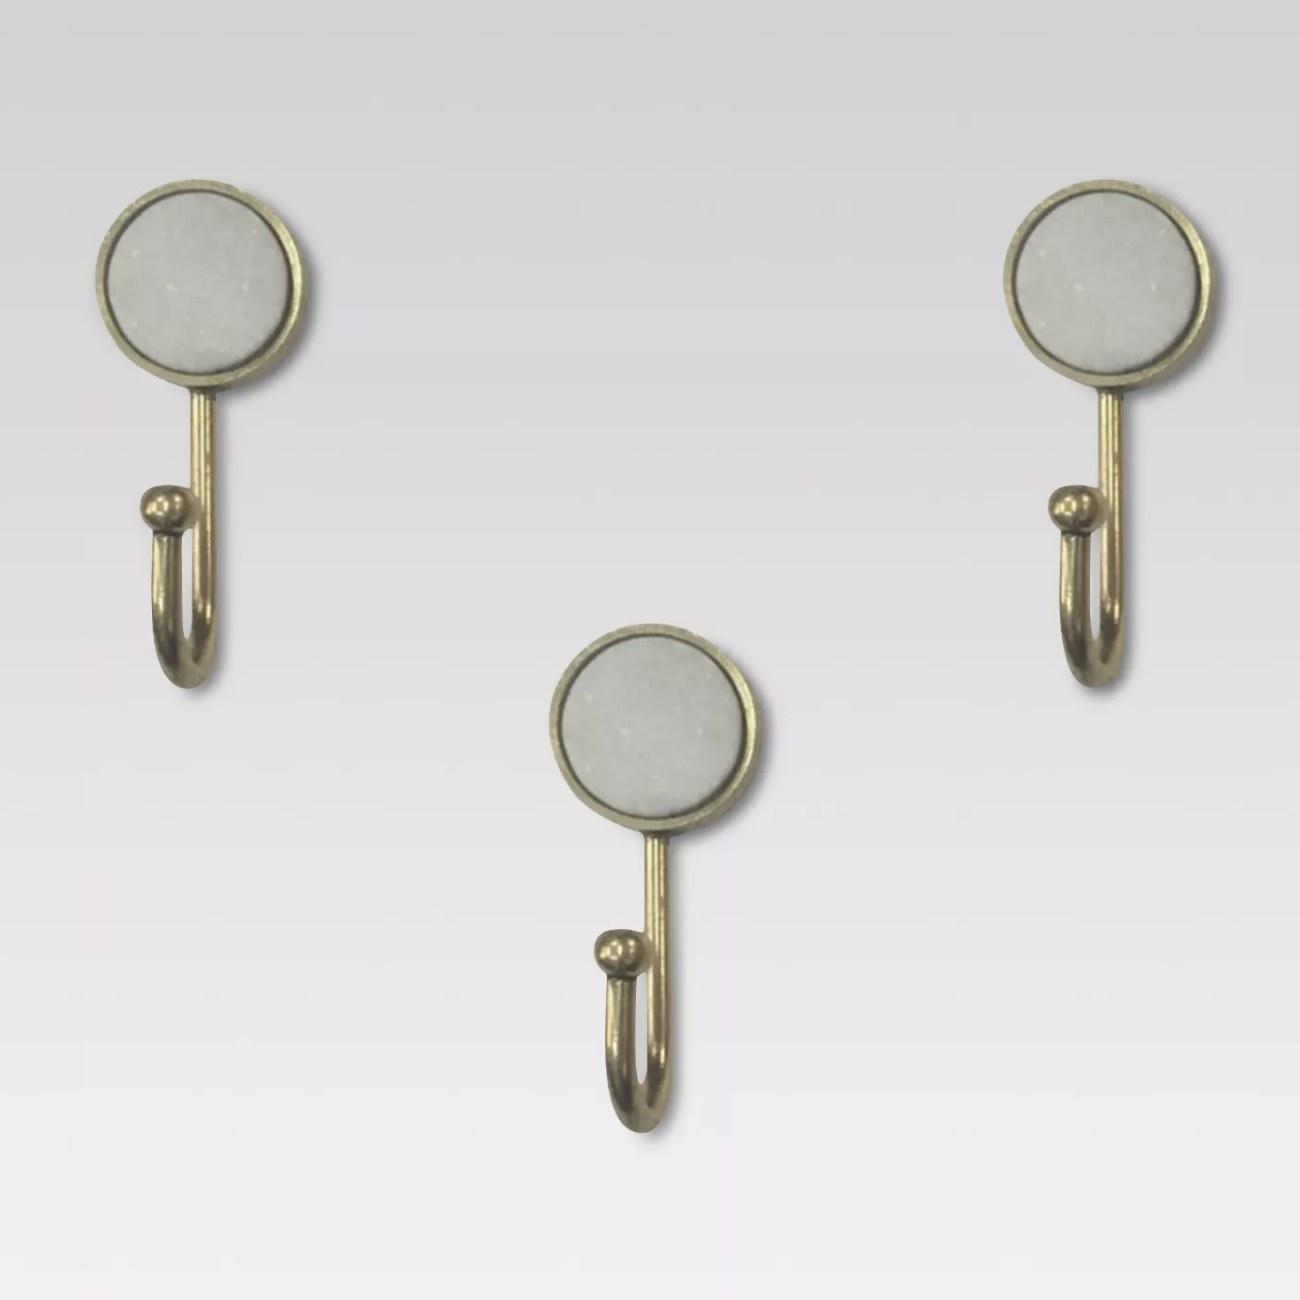 Three gold metal hooks